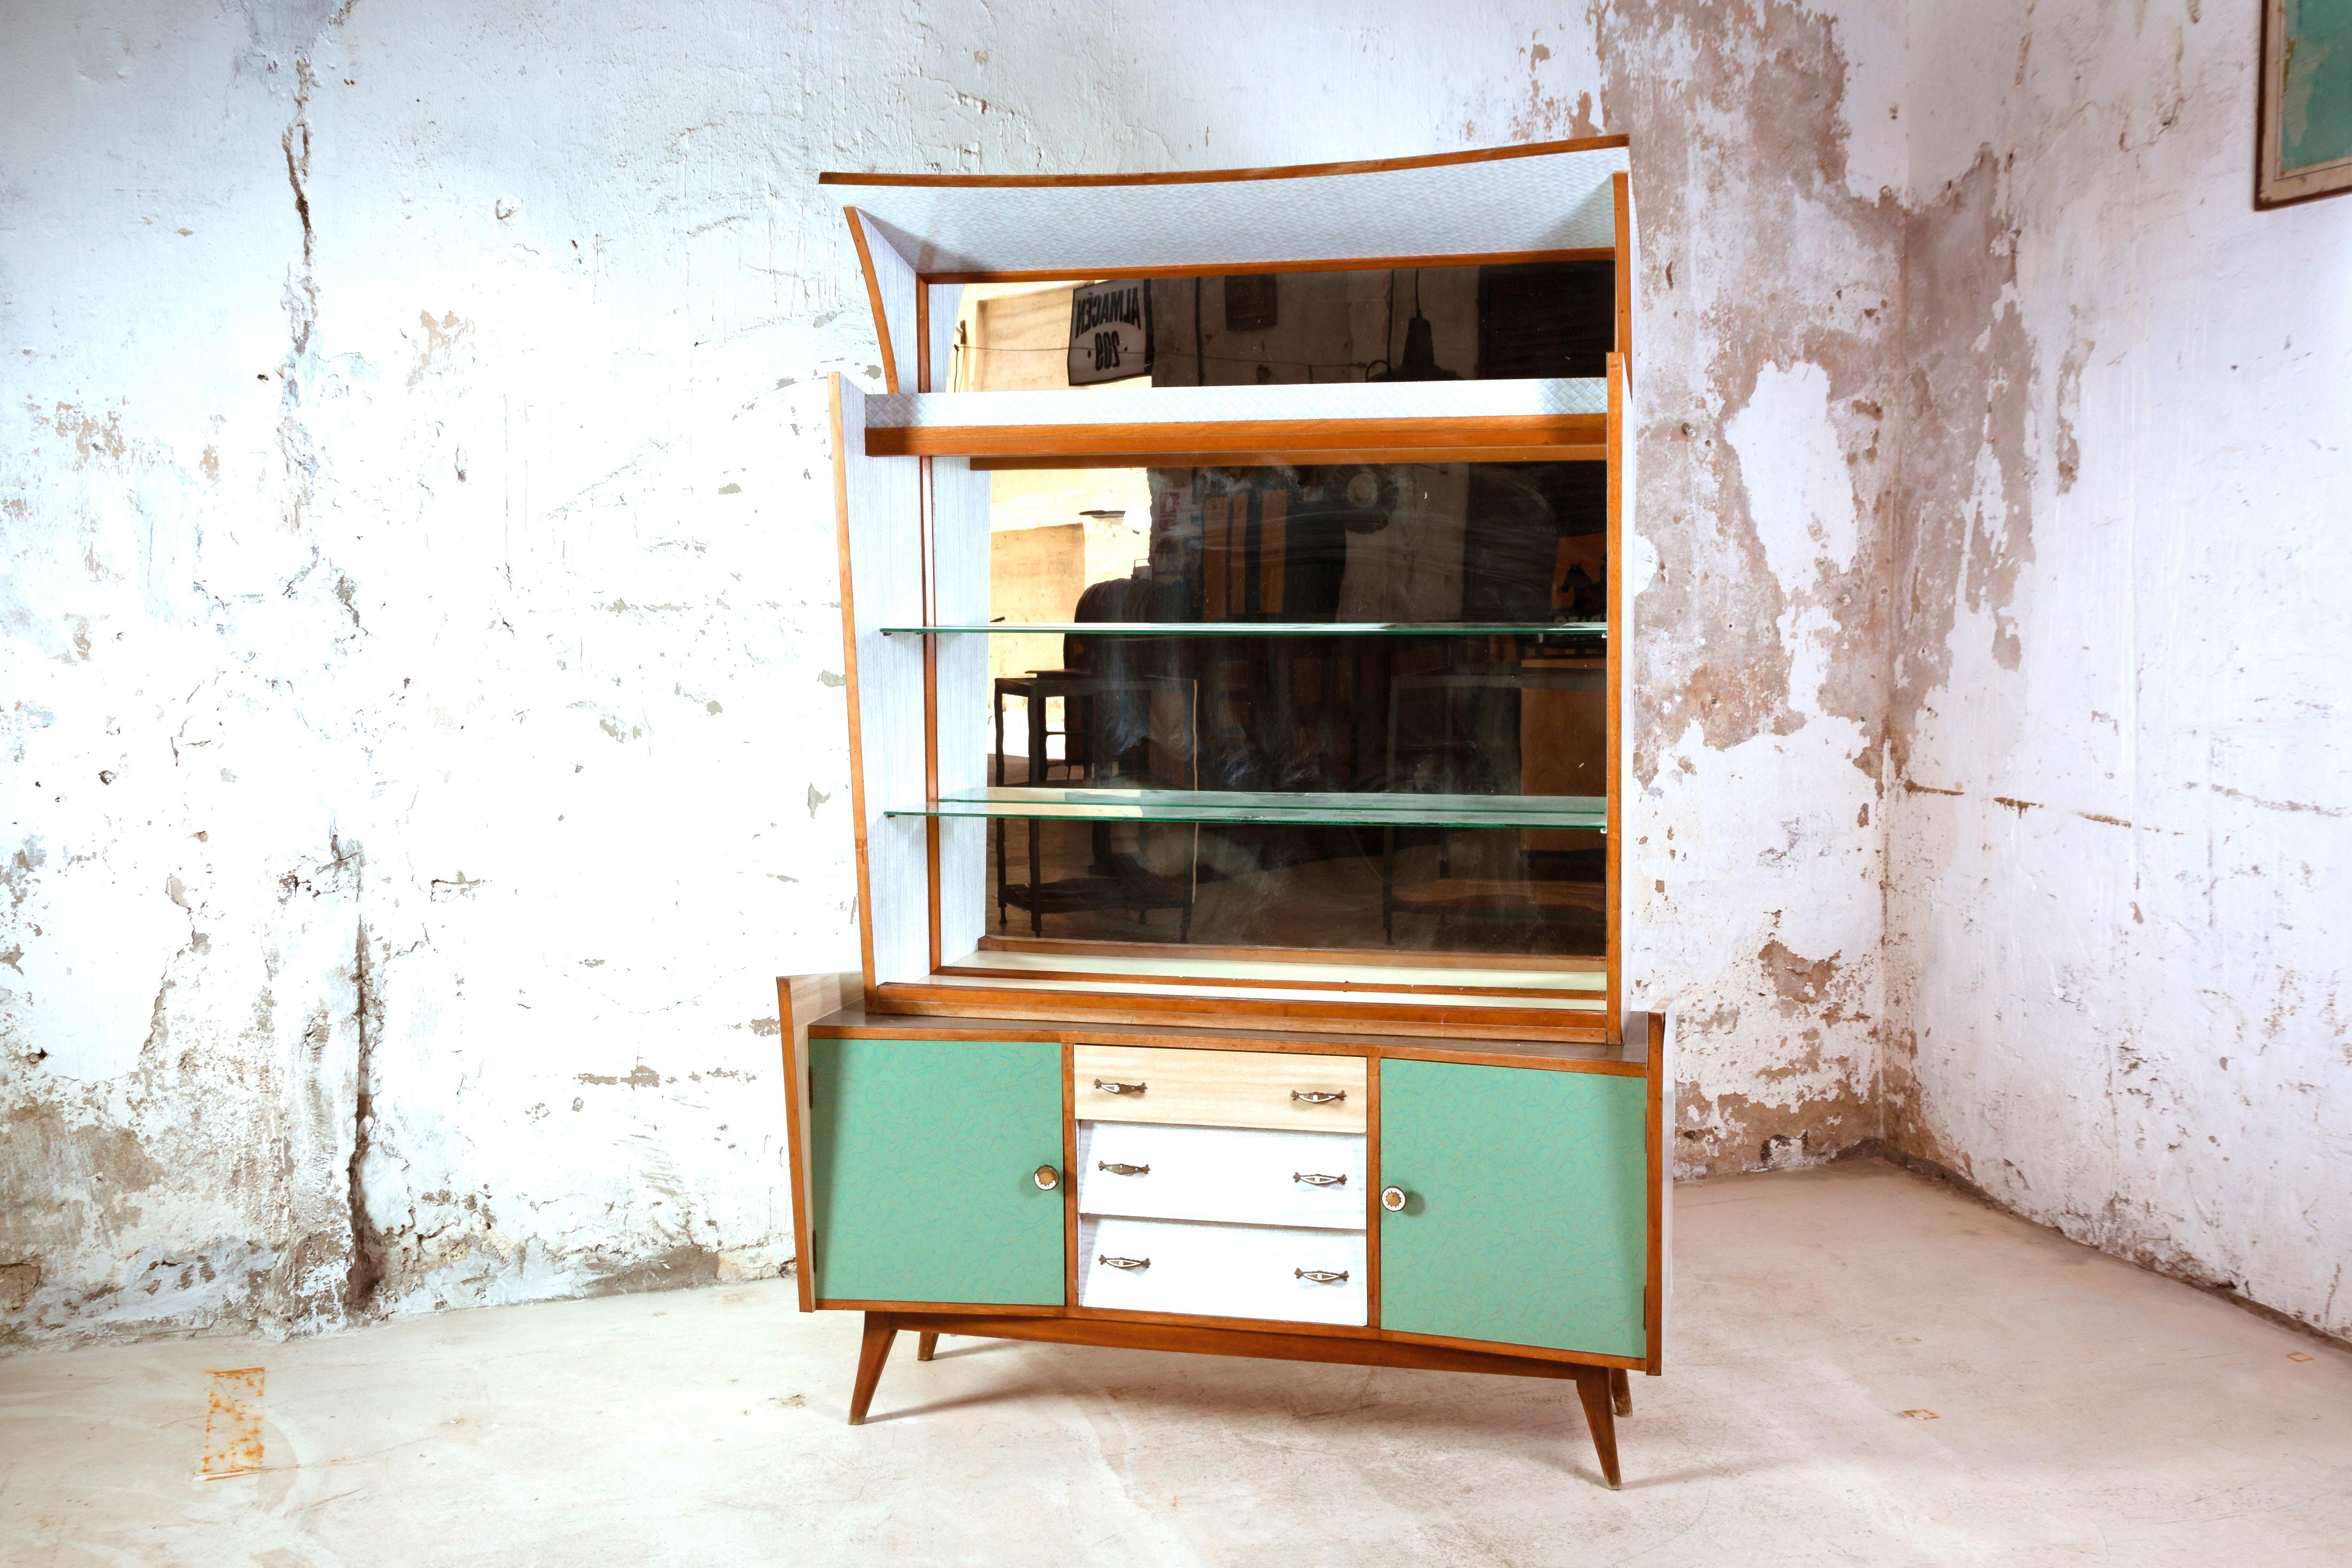 Librer a estanter a madera y formica polonium 209 - Formica madera ...